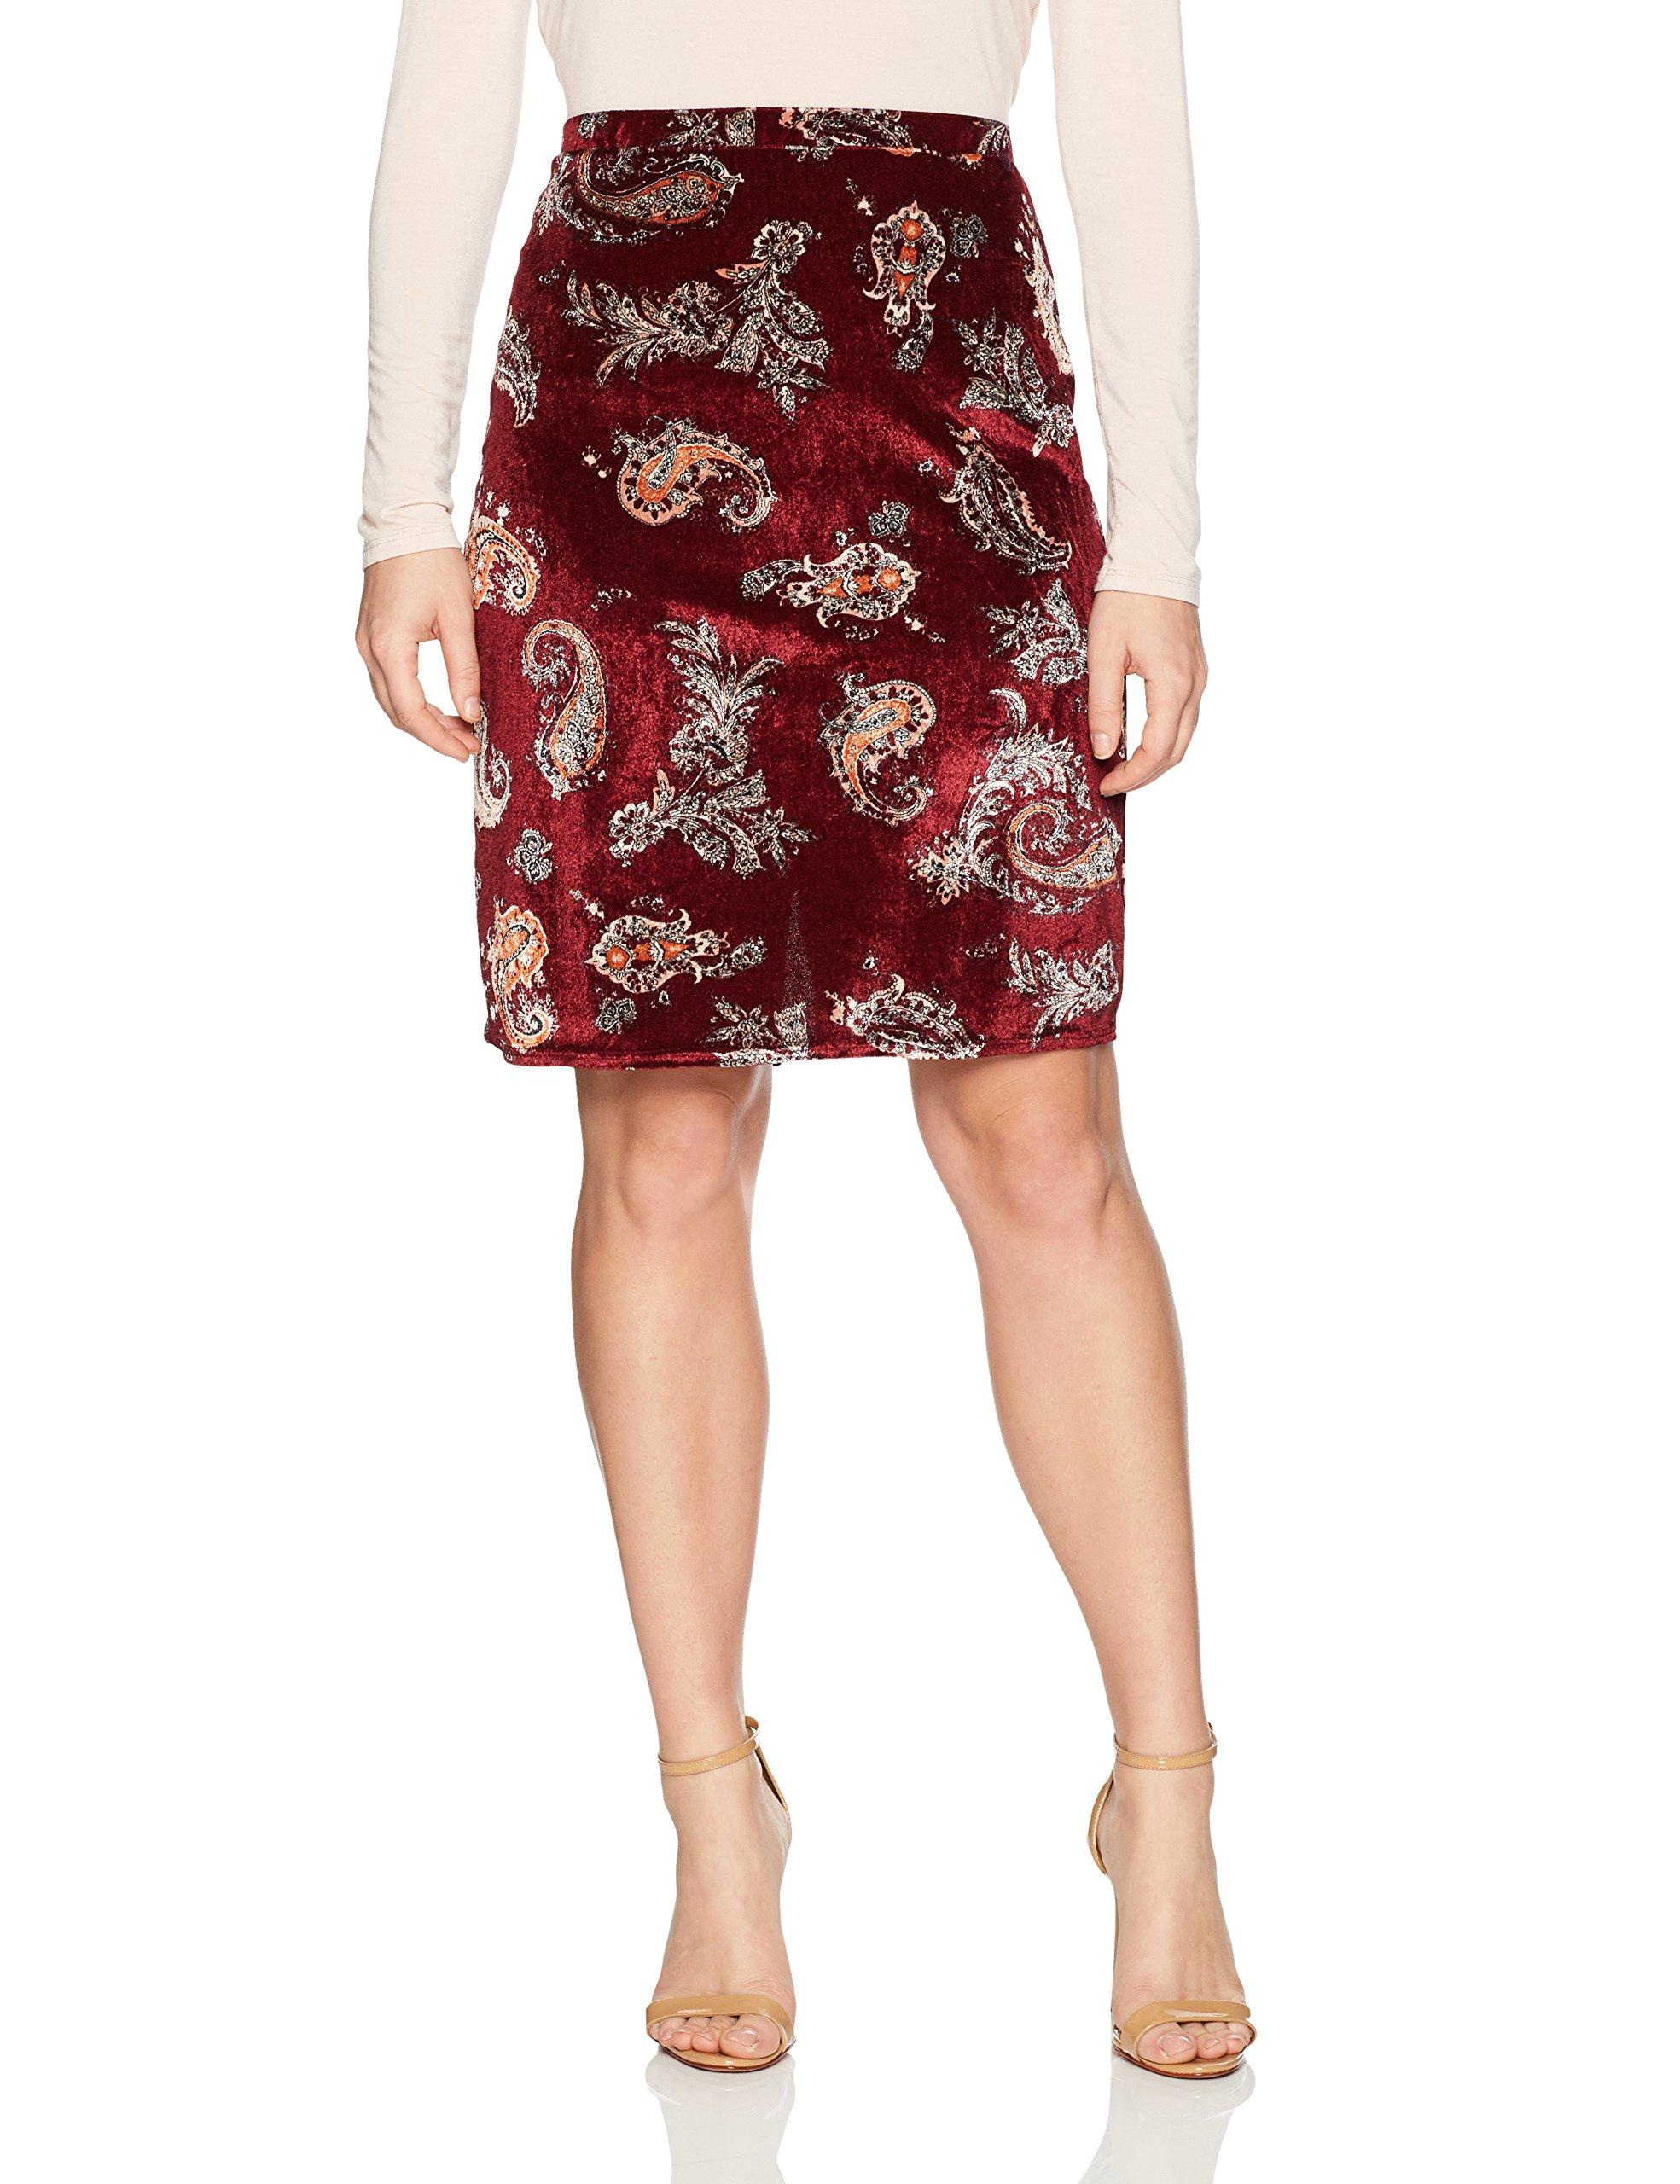 Star Vixen Women's Petite Knee Length Classic Stretch Pencil Skirt, Burgundy Ground Paisley, PL